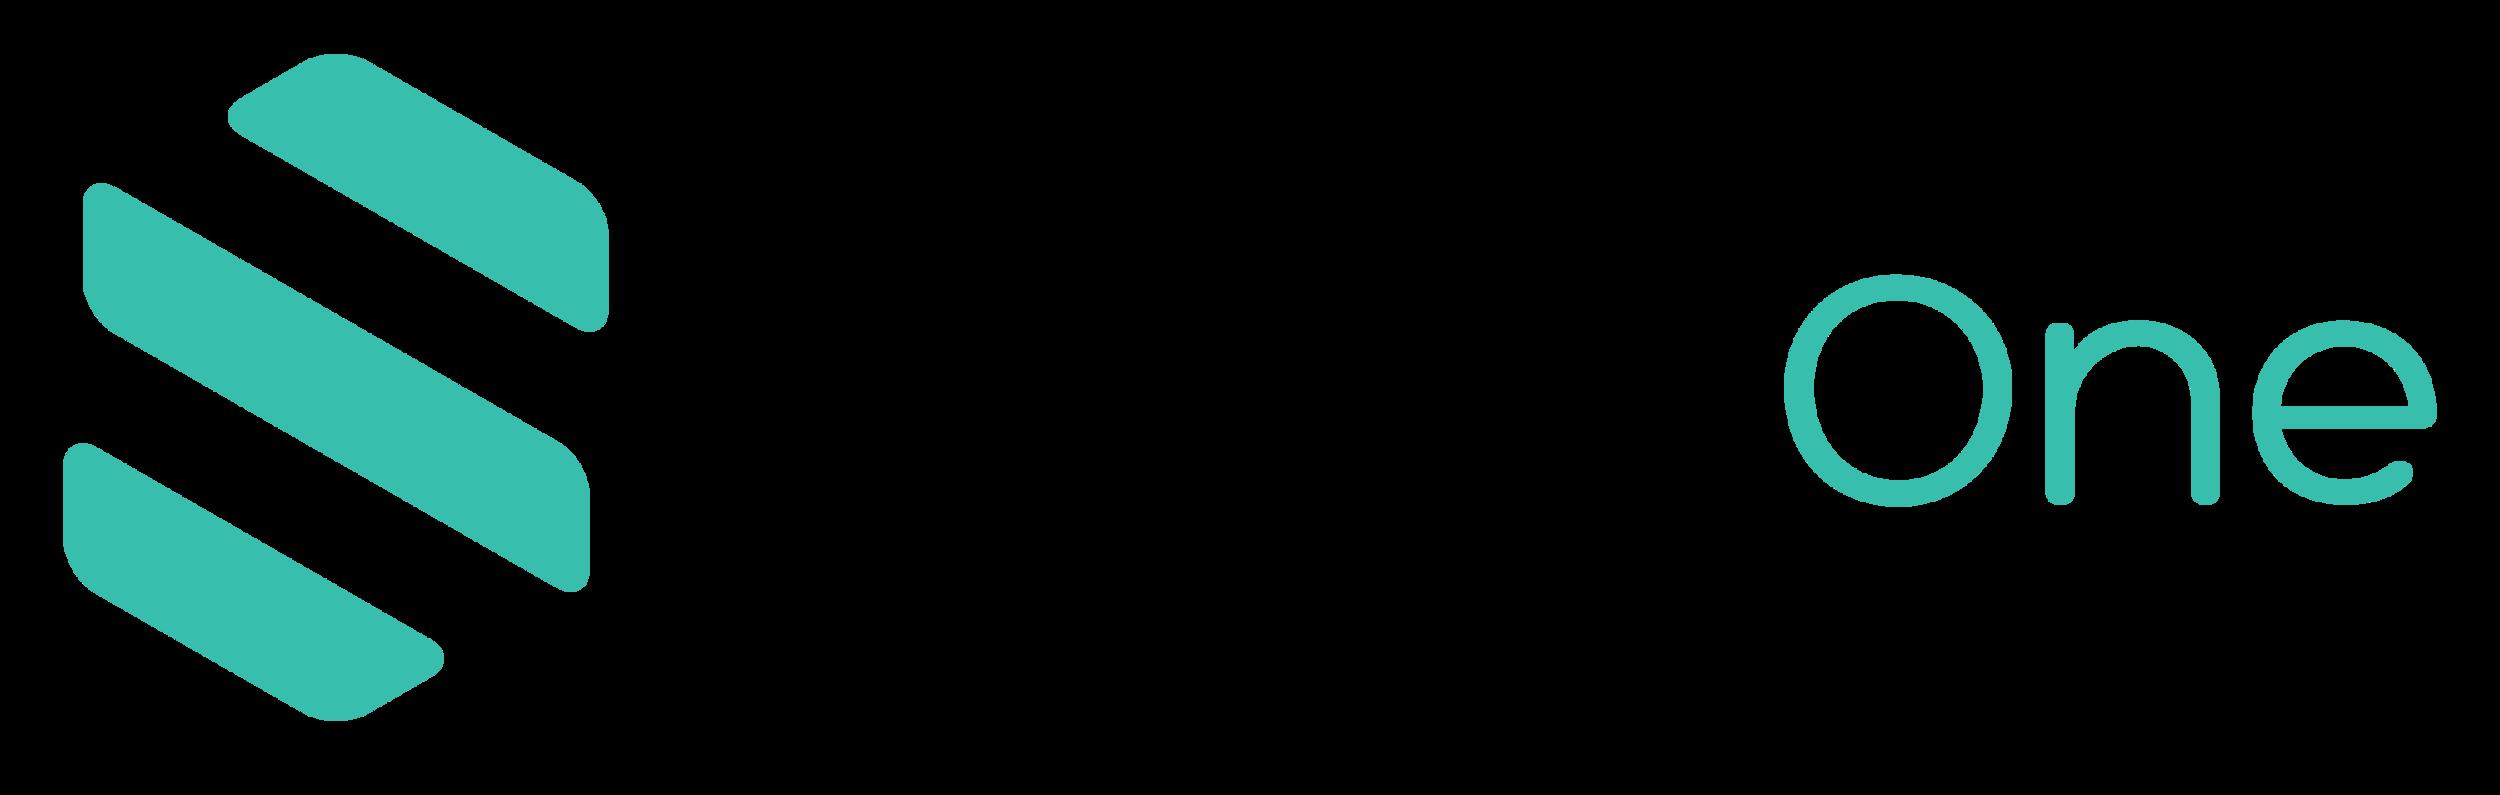 SelectOne transparent logo.png